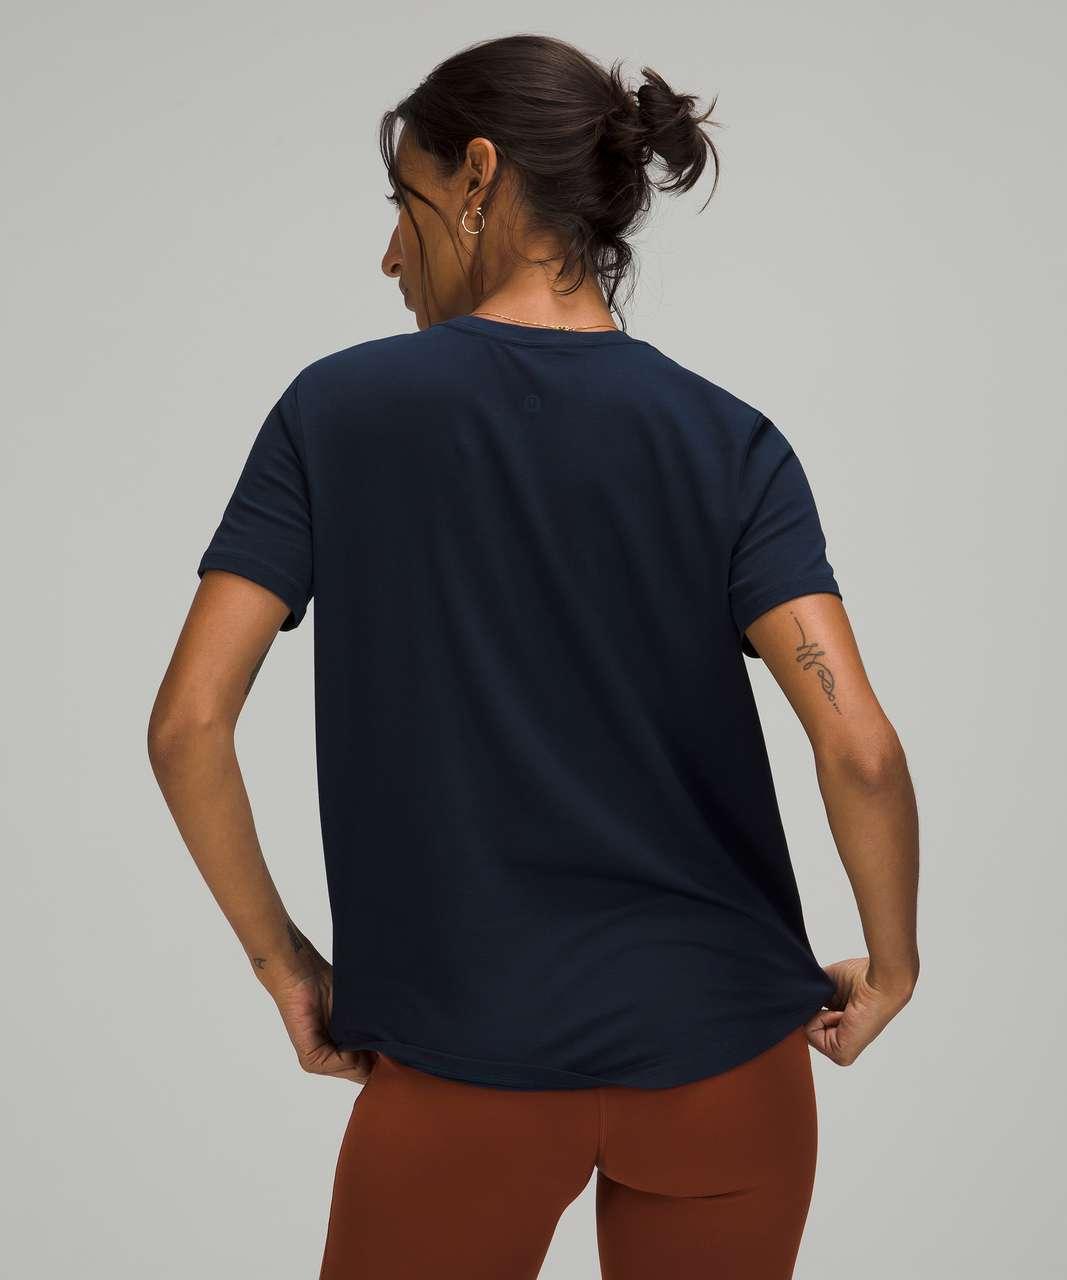 Lululemon Love Tee Short Sleeve V-Neck T-Shirt - True Navy